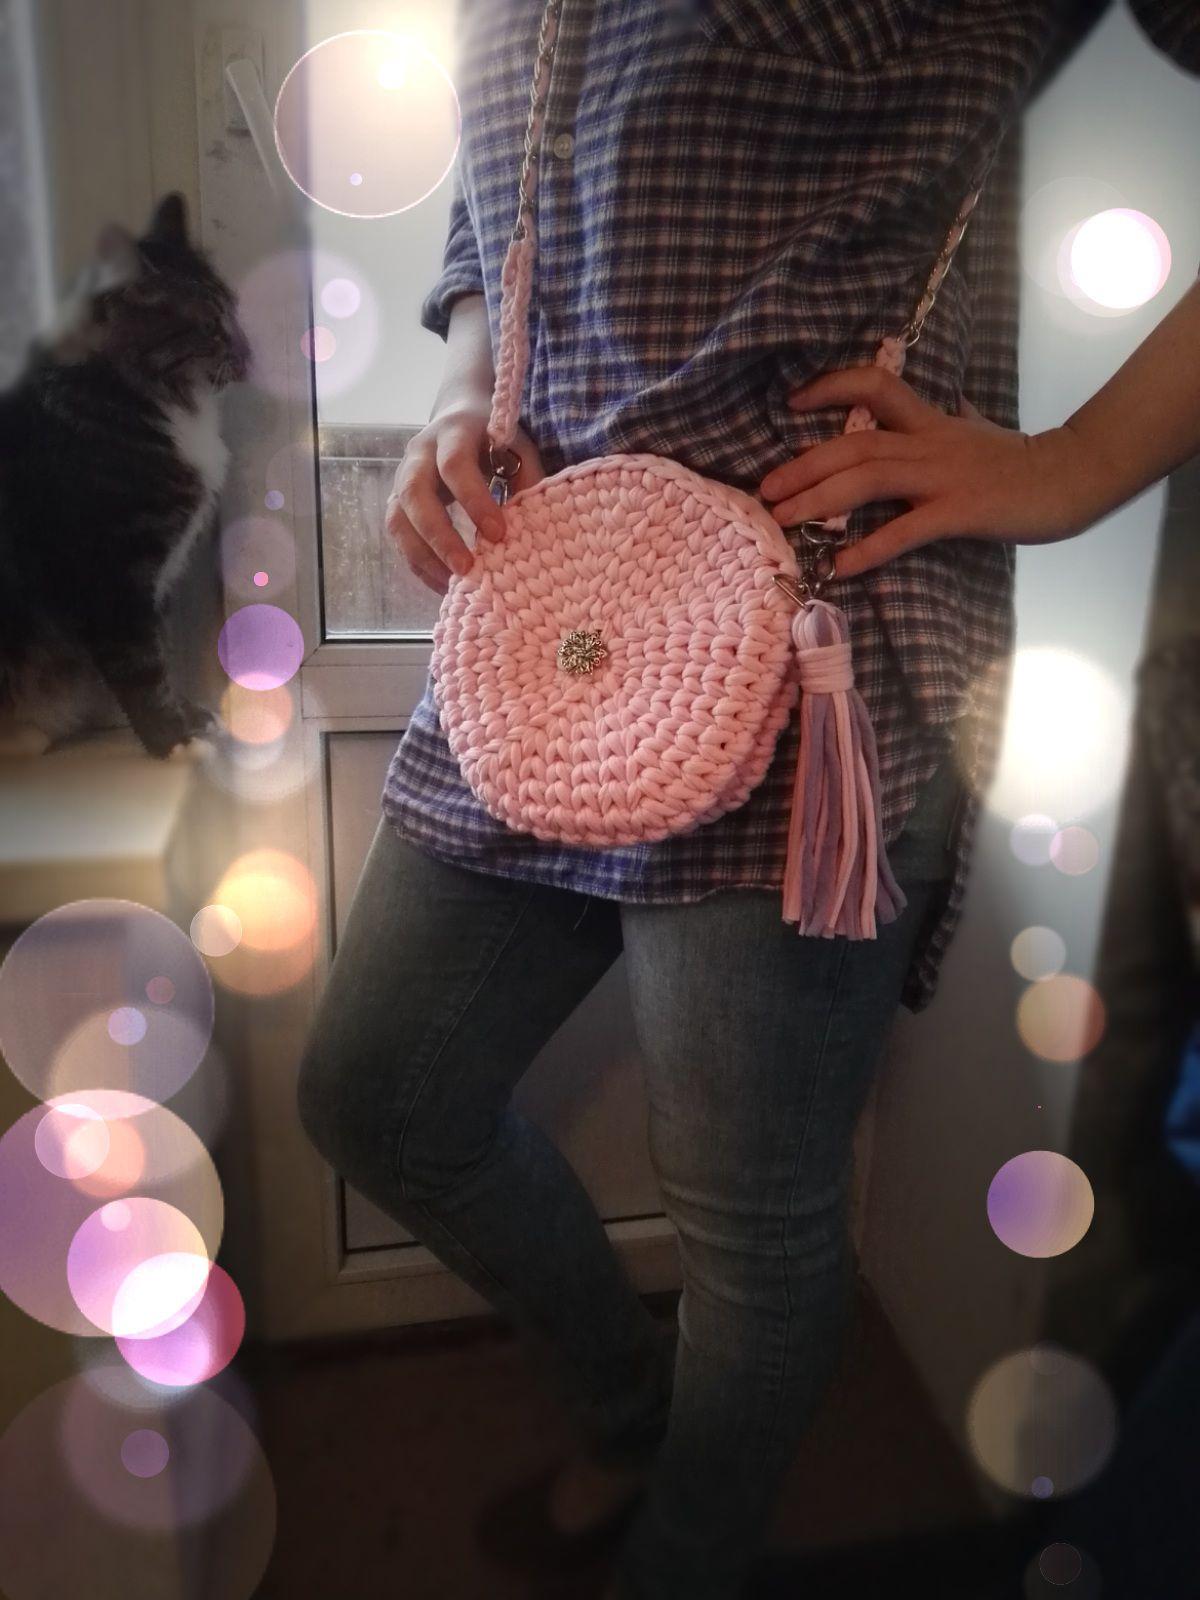 круглая розовый сумка трикотажная клатч пряжа